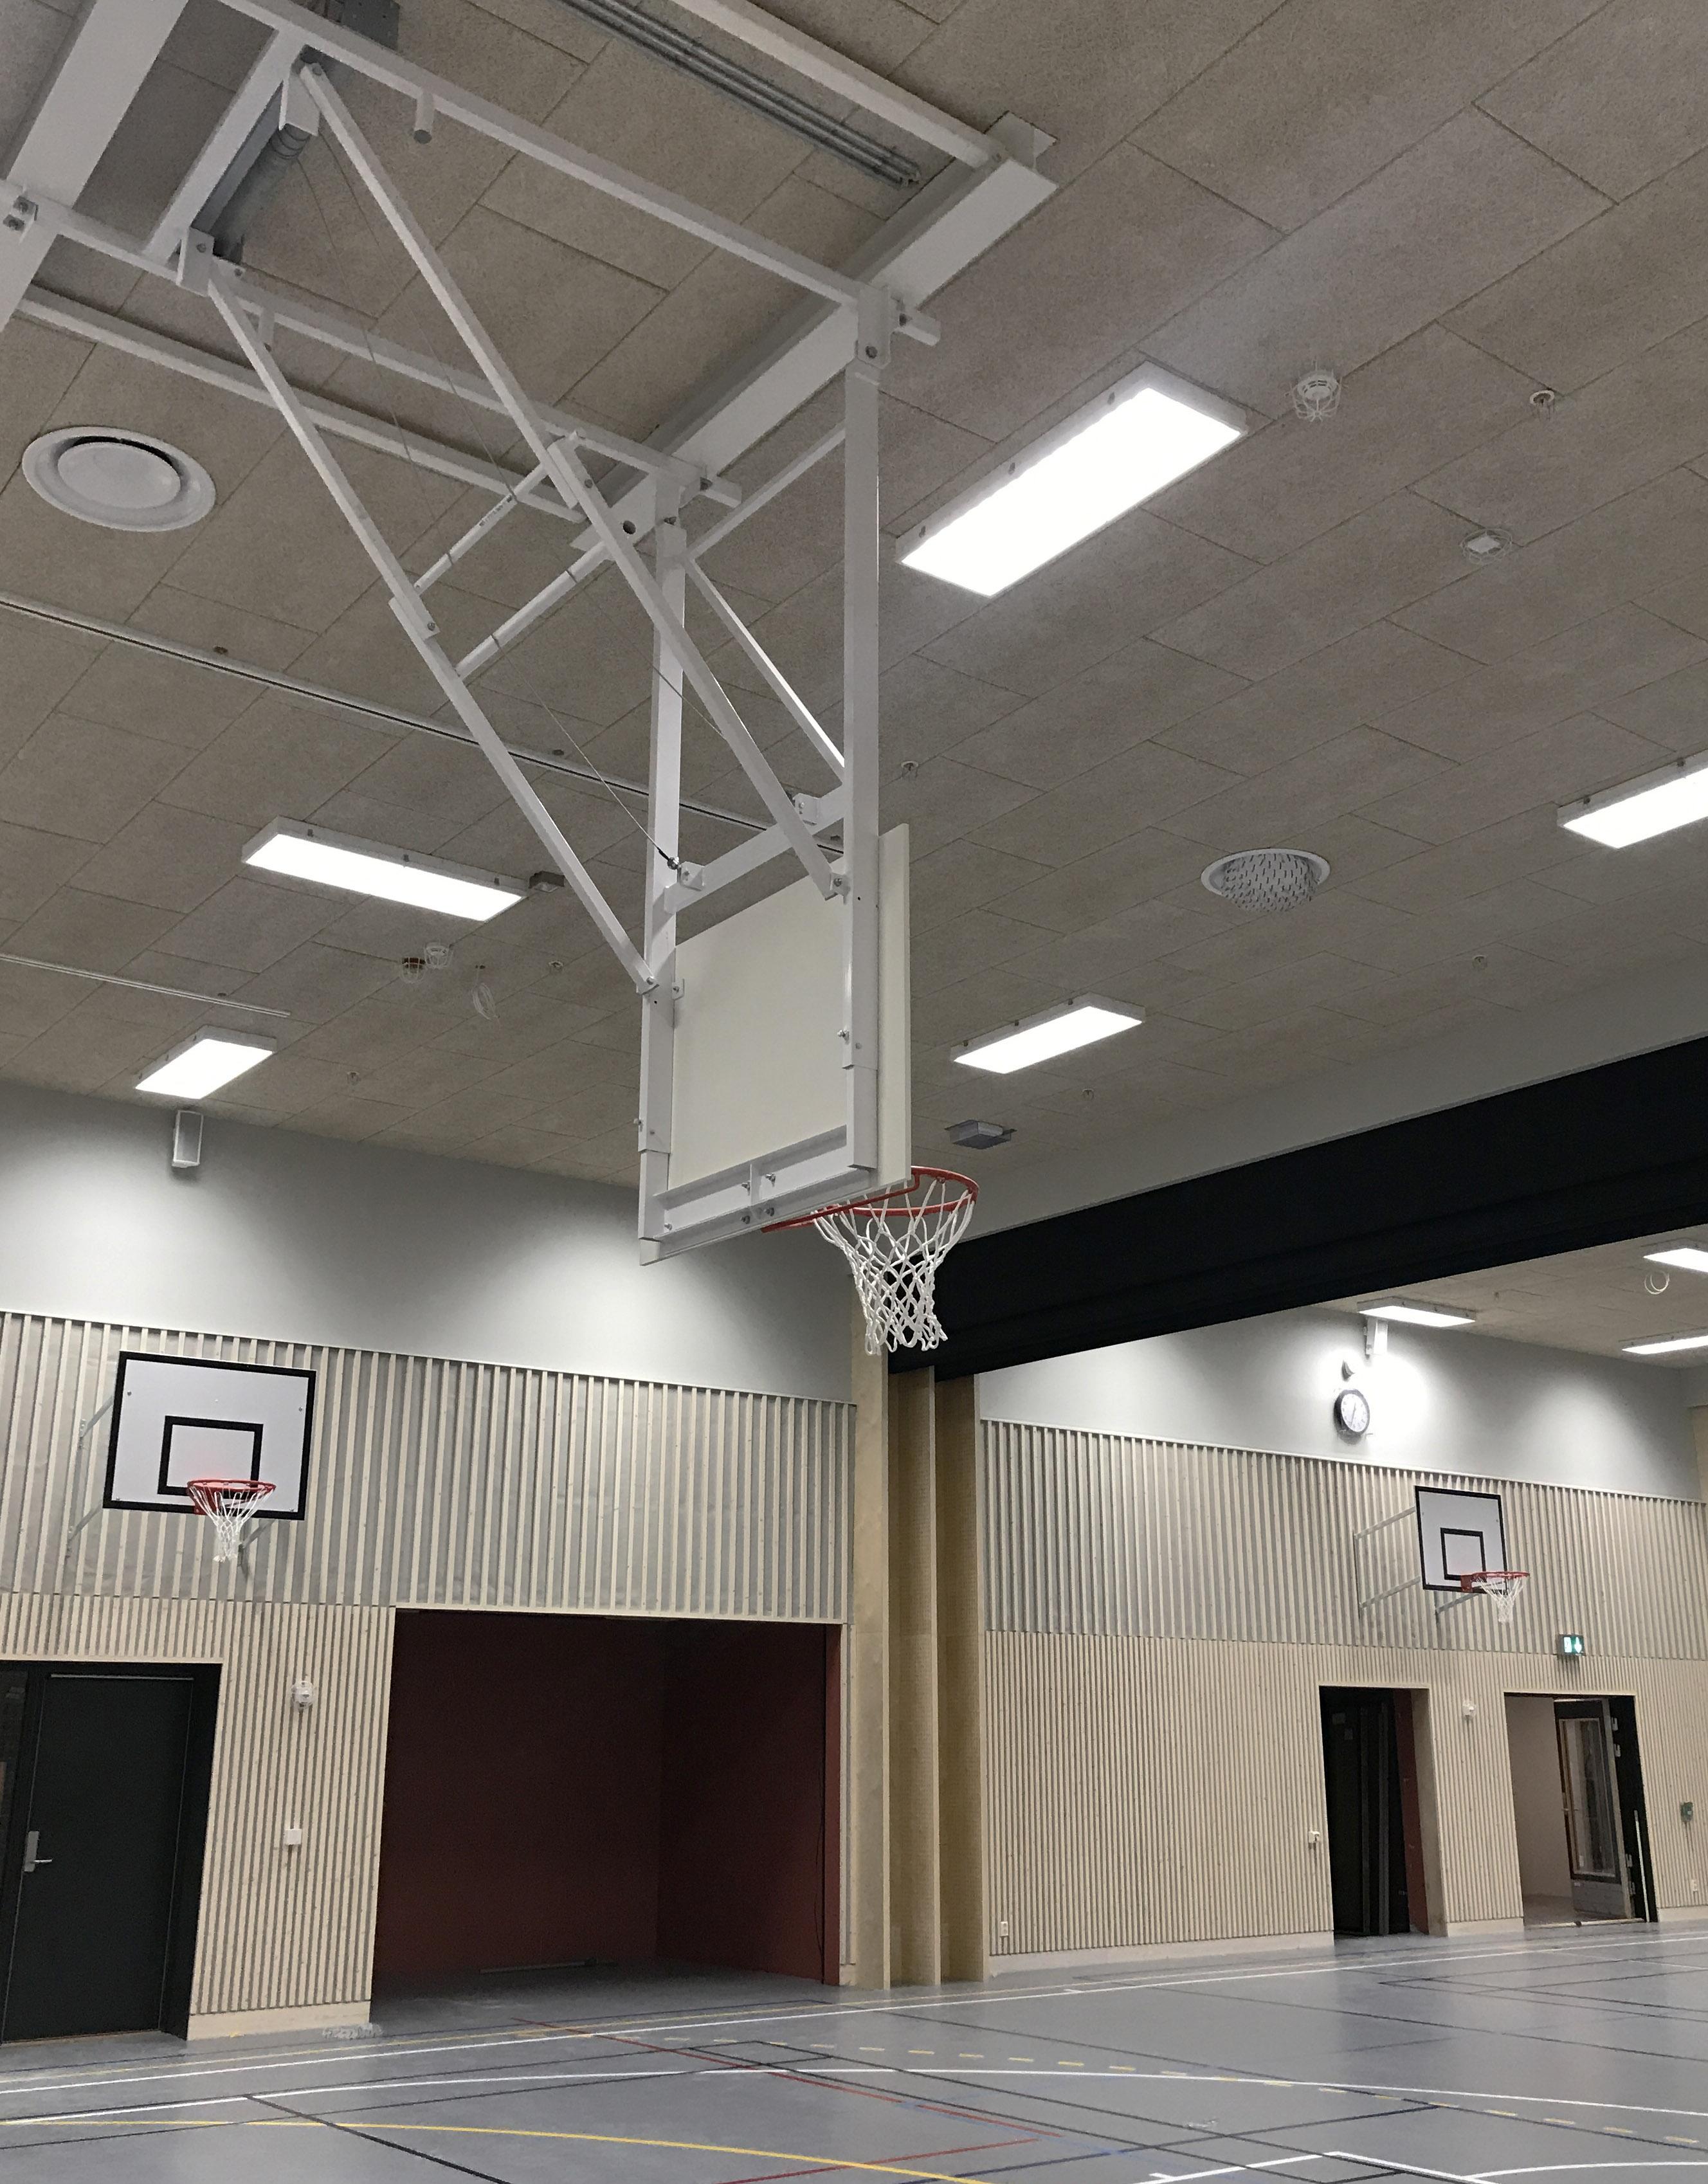 automatisk takhengt basketstativ unisport